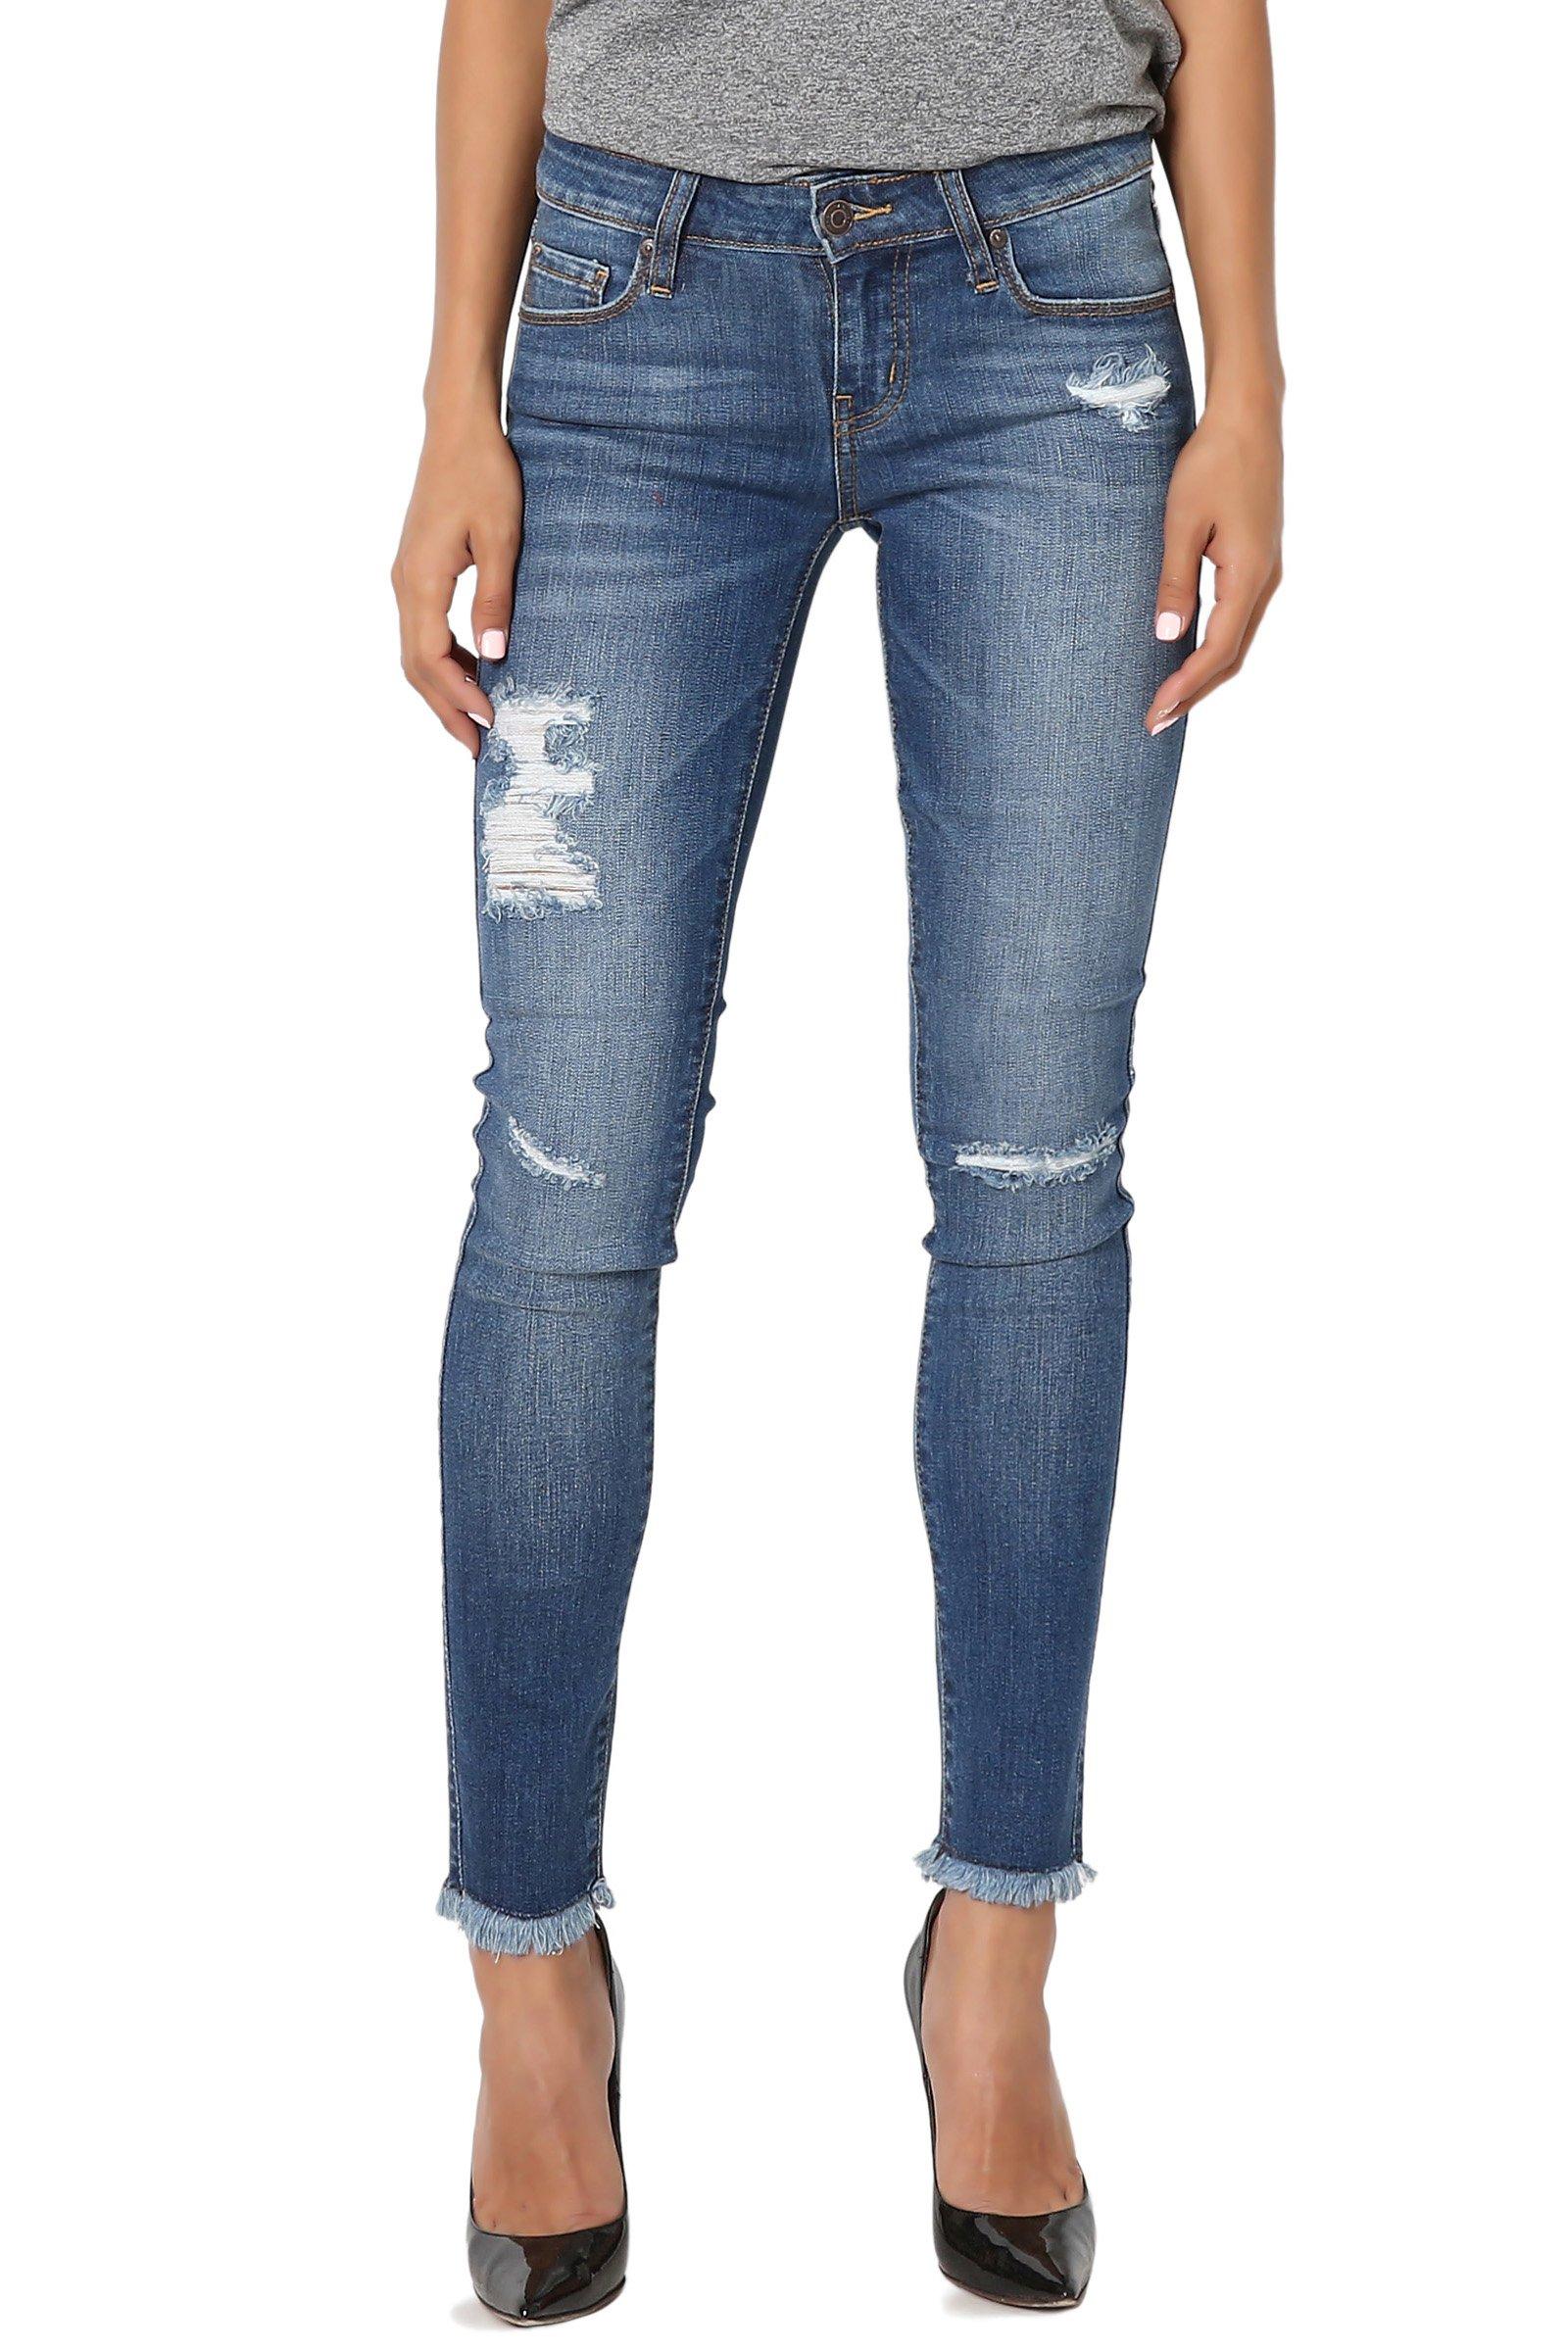 TheMogan Women's Frayed Dustressed Soft Rayon Denim Crop Skinny Jeans Medium 5